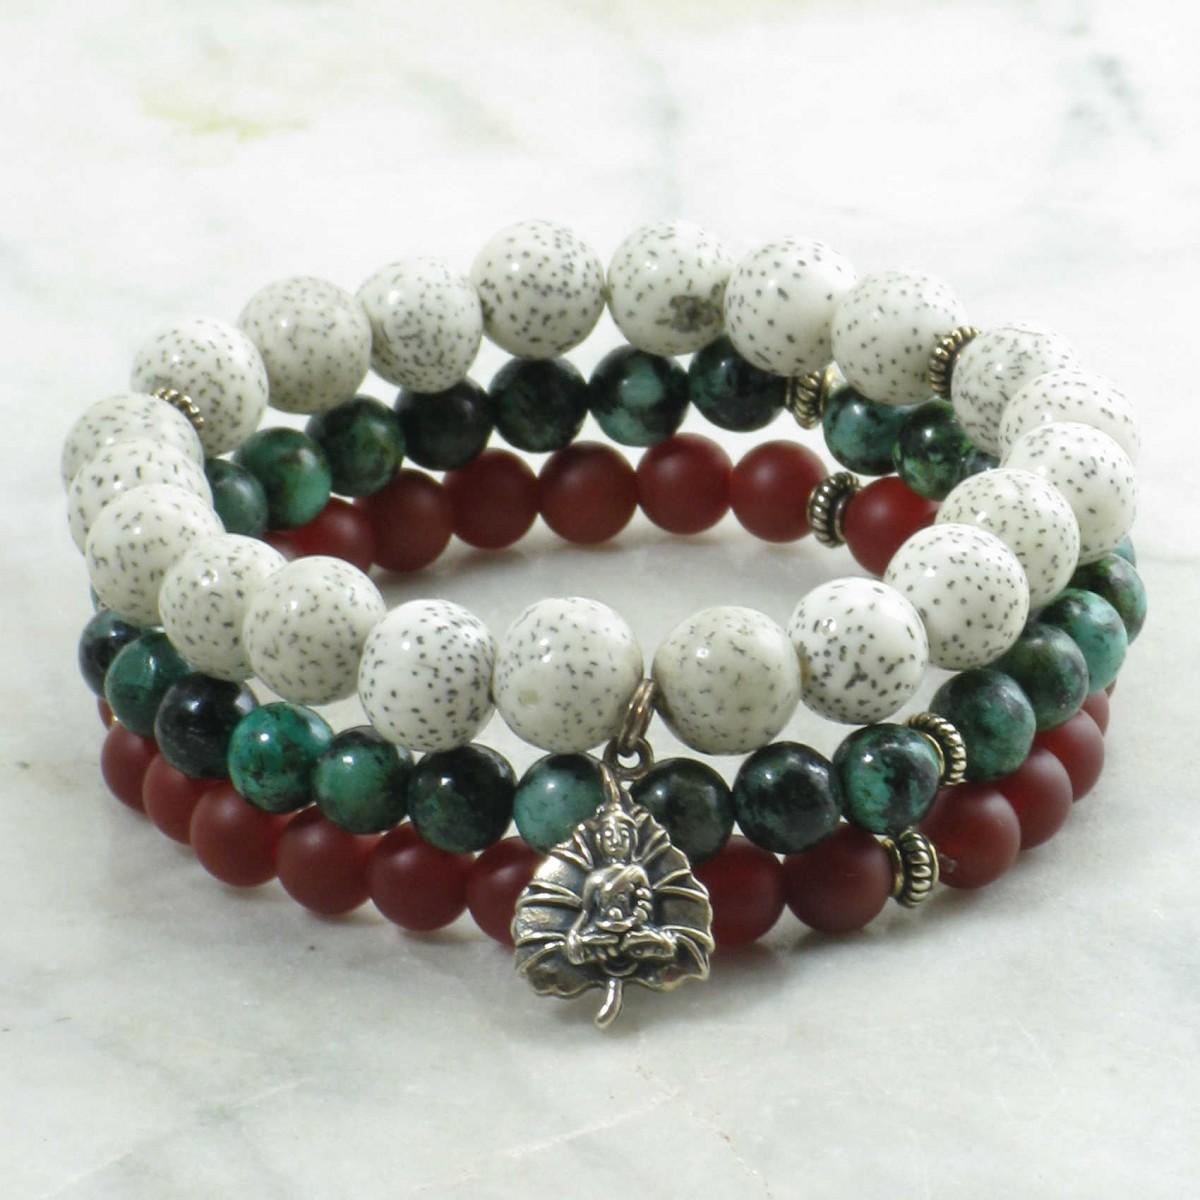 Nirvana_Mala_Beads_Stack_21_Lotus_Seeds_Turquoise_Red_Agate_Mala_Beads_Buddhist_Prayer_Beads